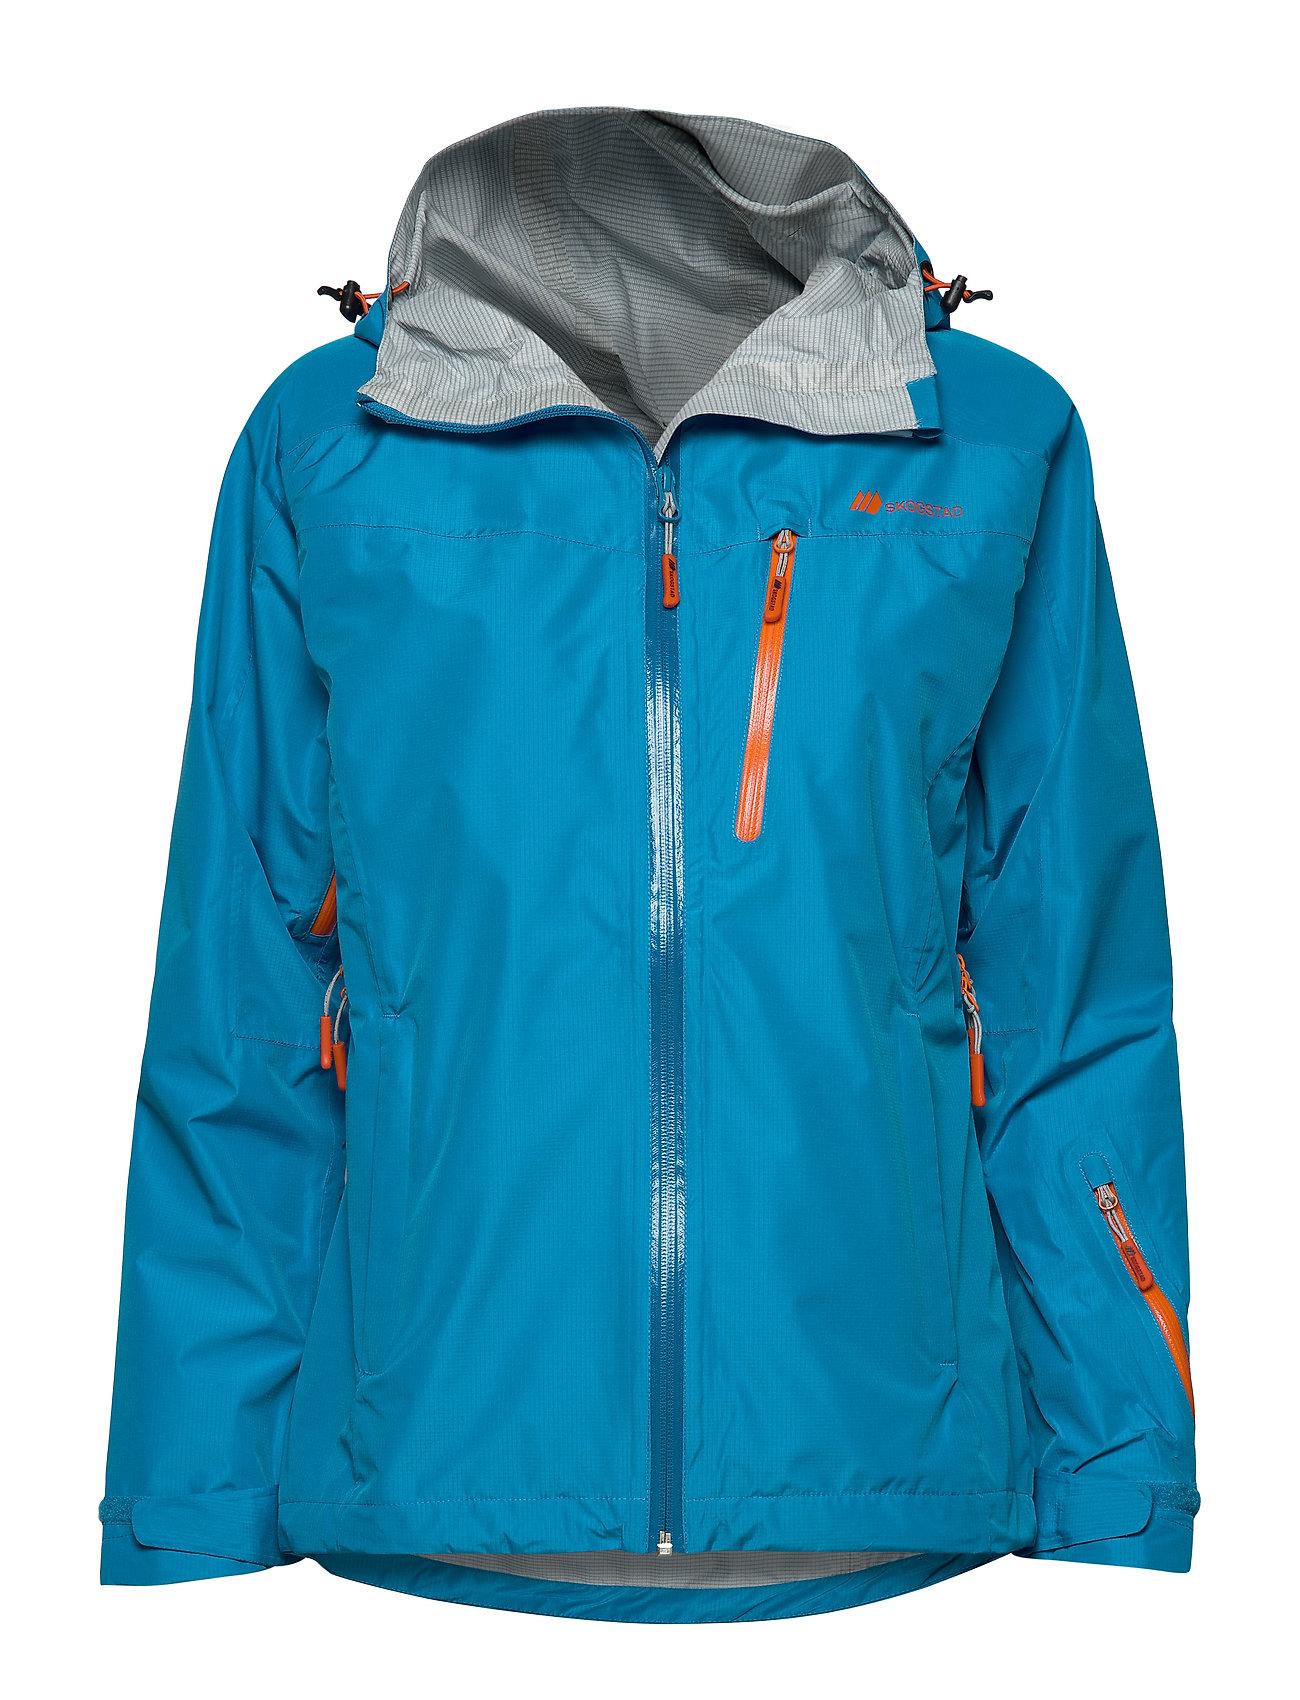 Skogstad Hornstinden 2.5-Layer Techincal jacket - WARM TURQOUISE